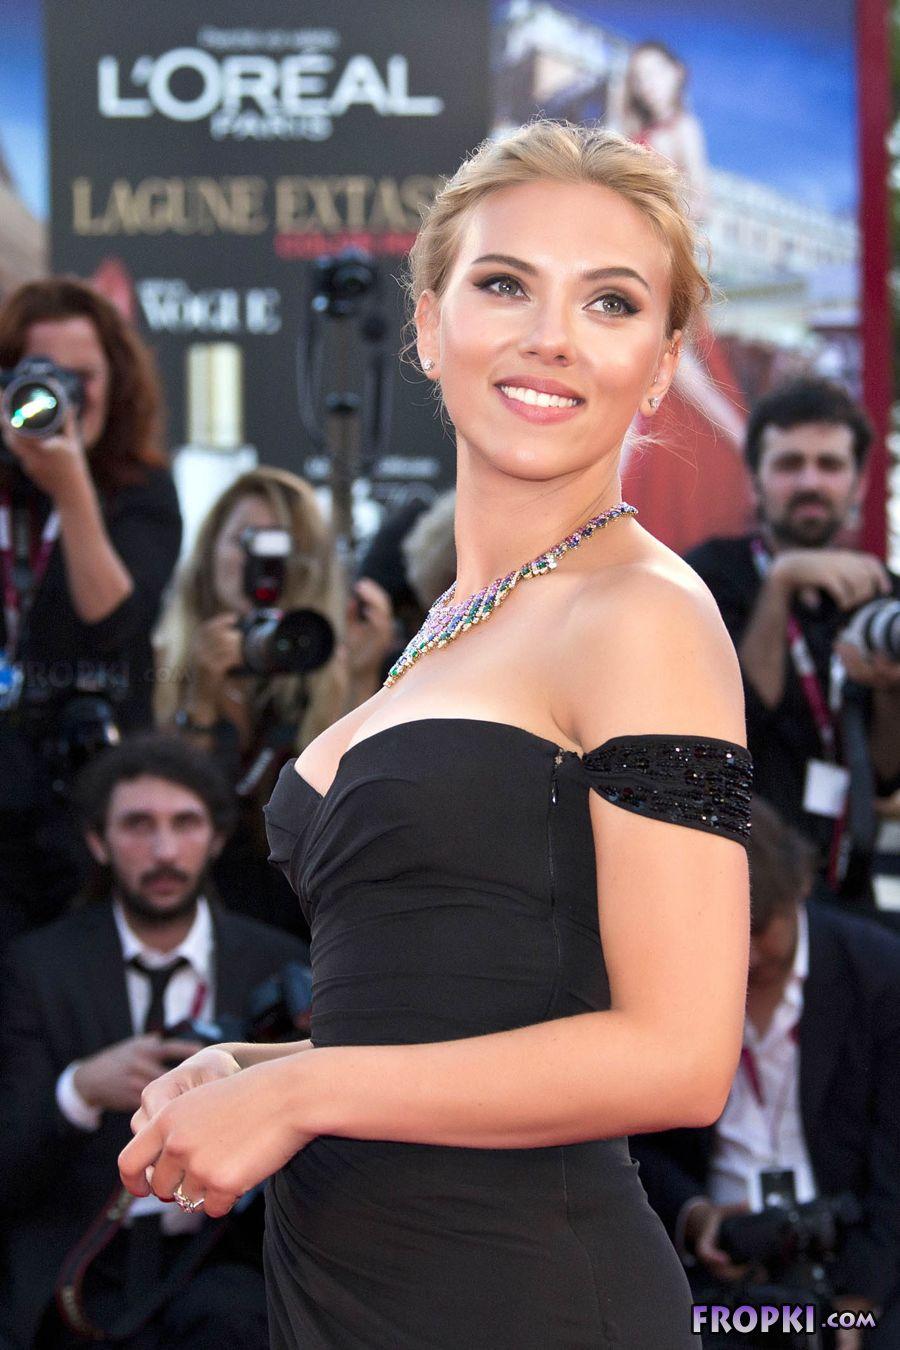 Scarlett Johansson Fropki 41